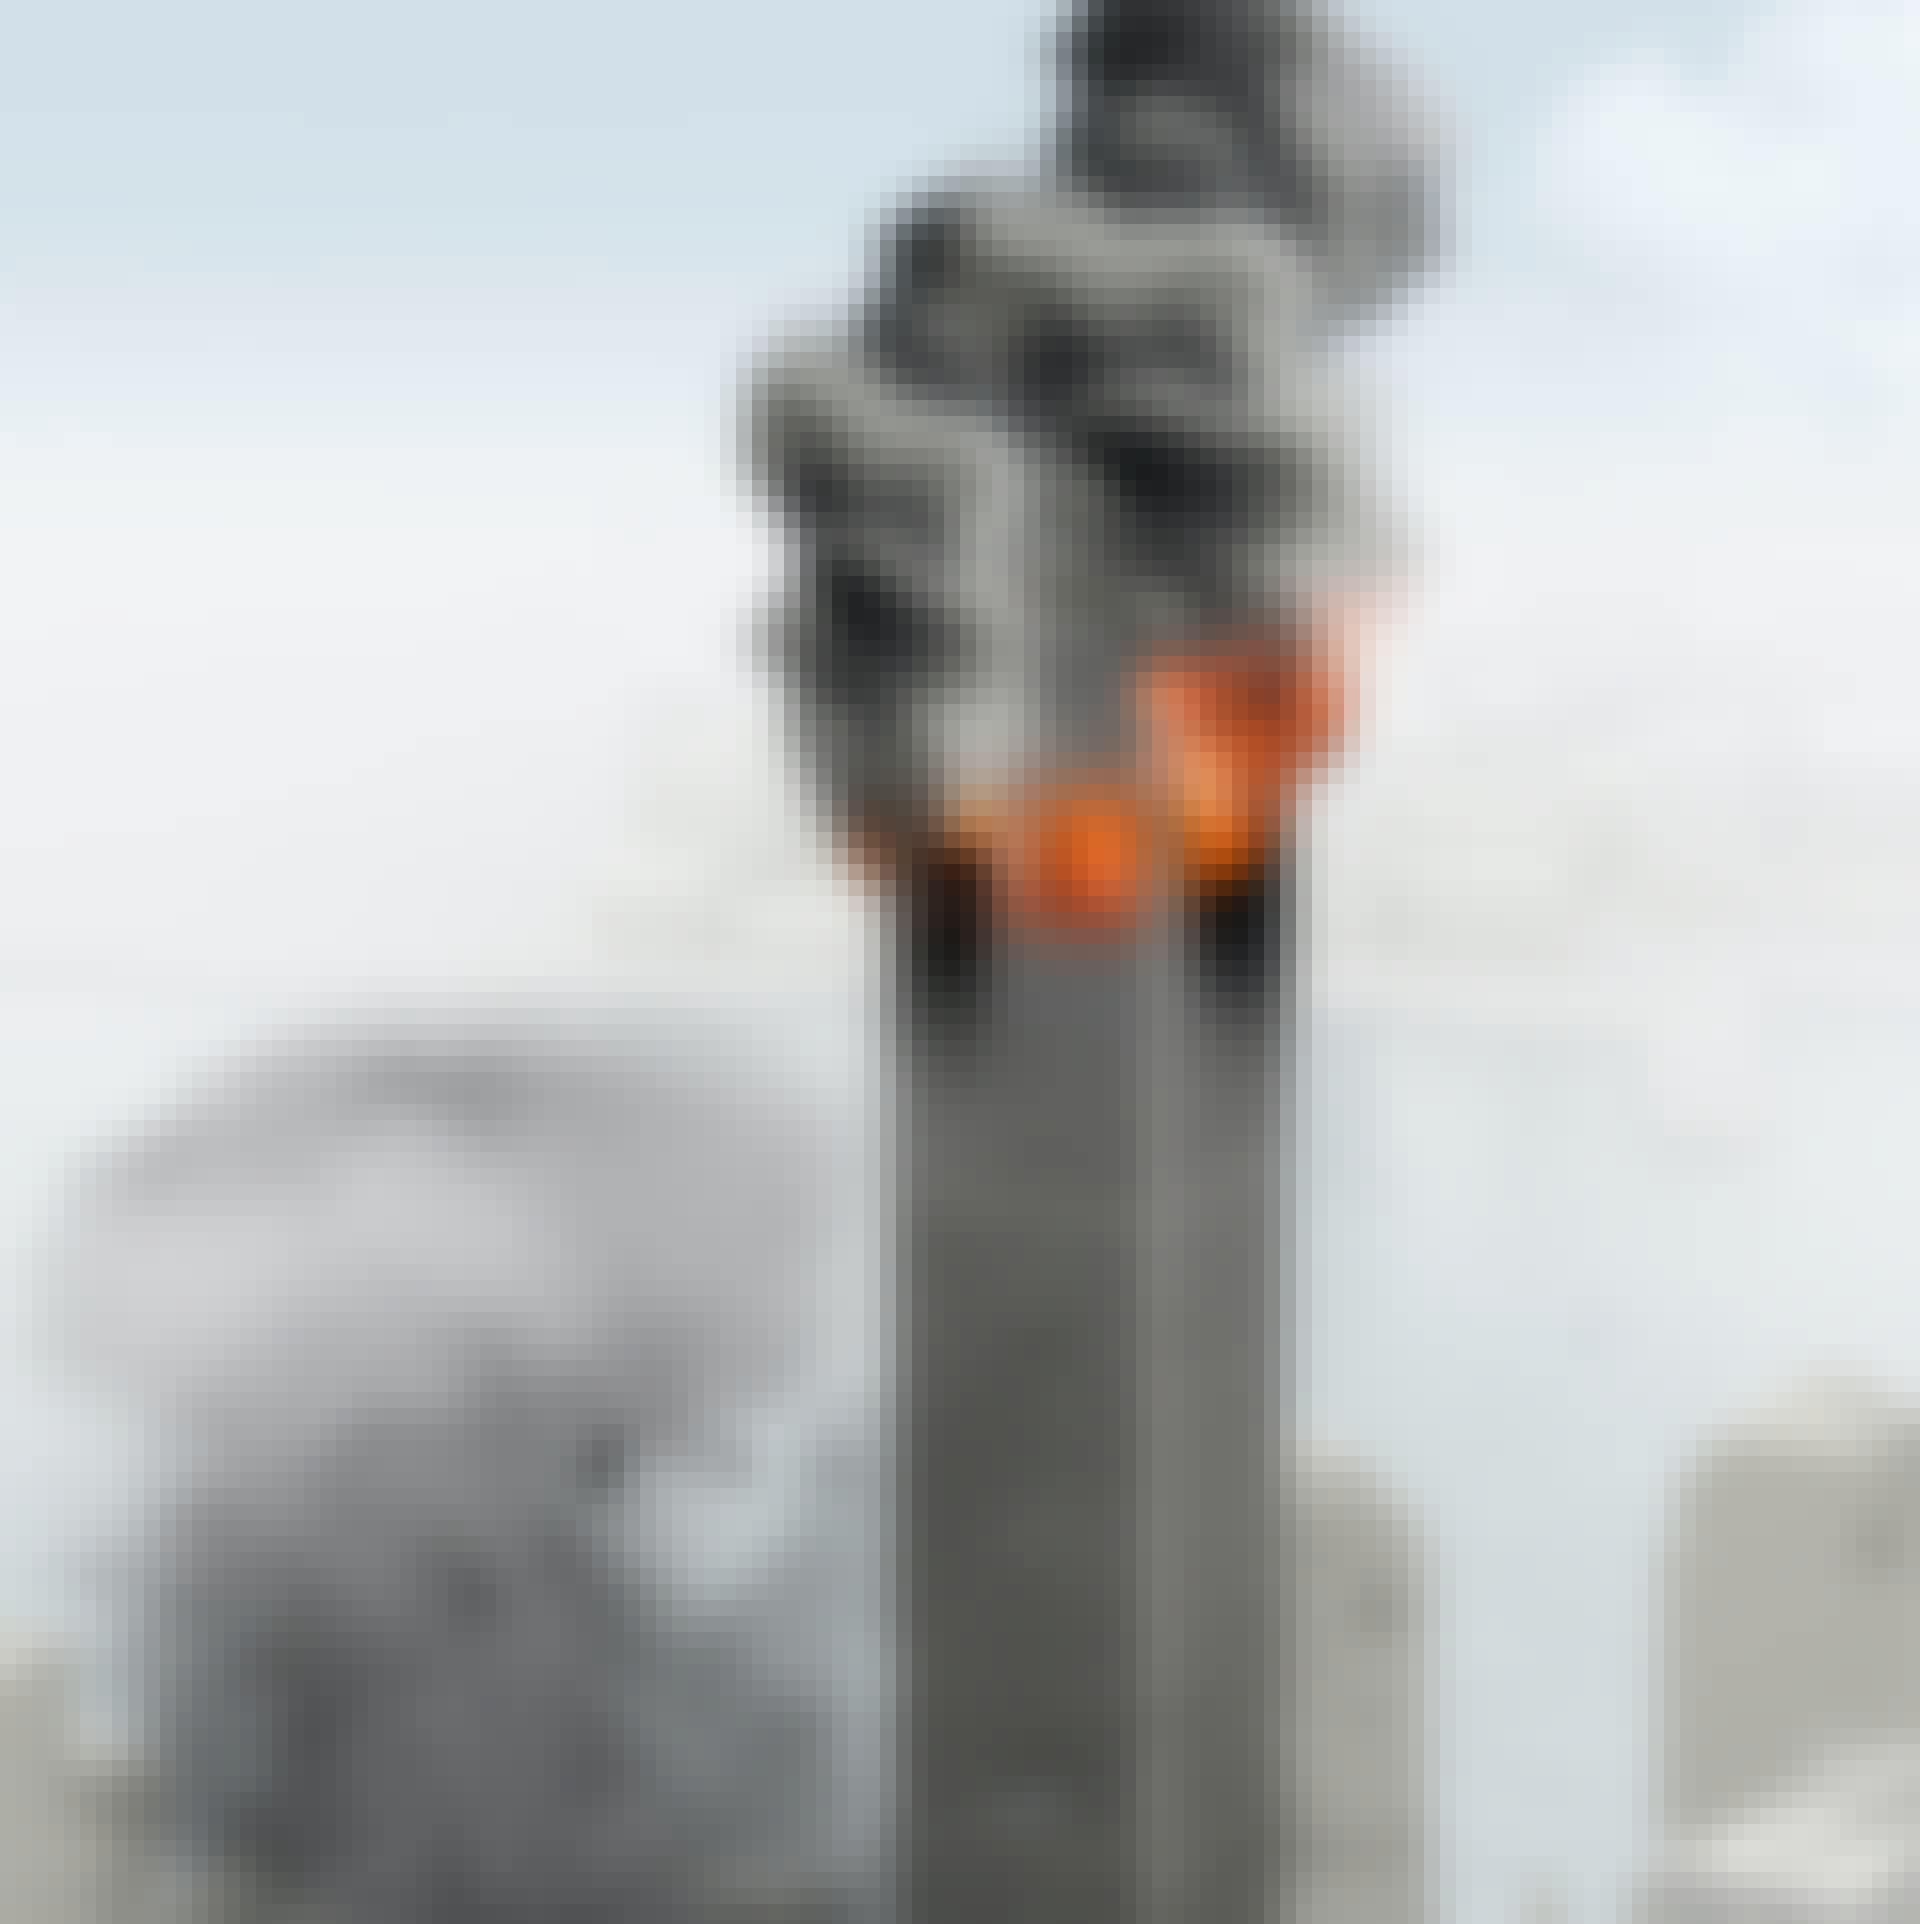 Tornit sortuvat: Vaihe 4